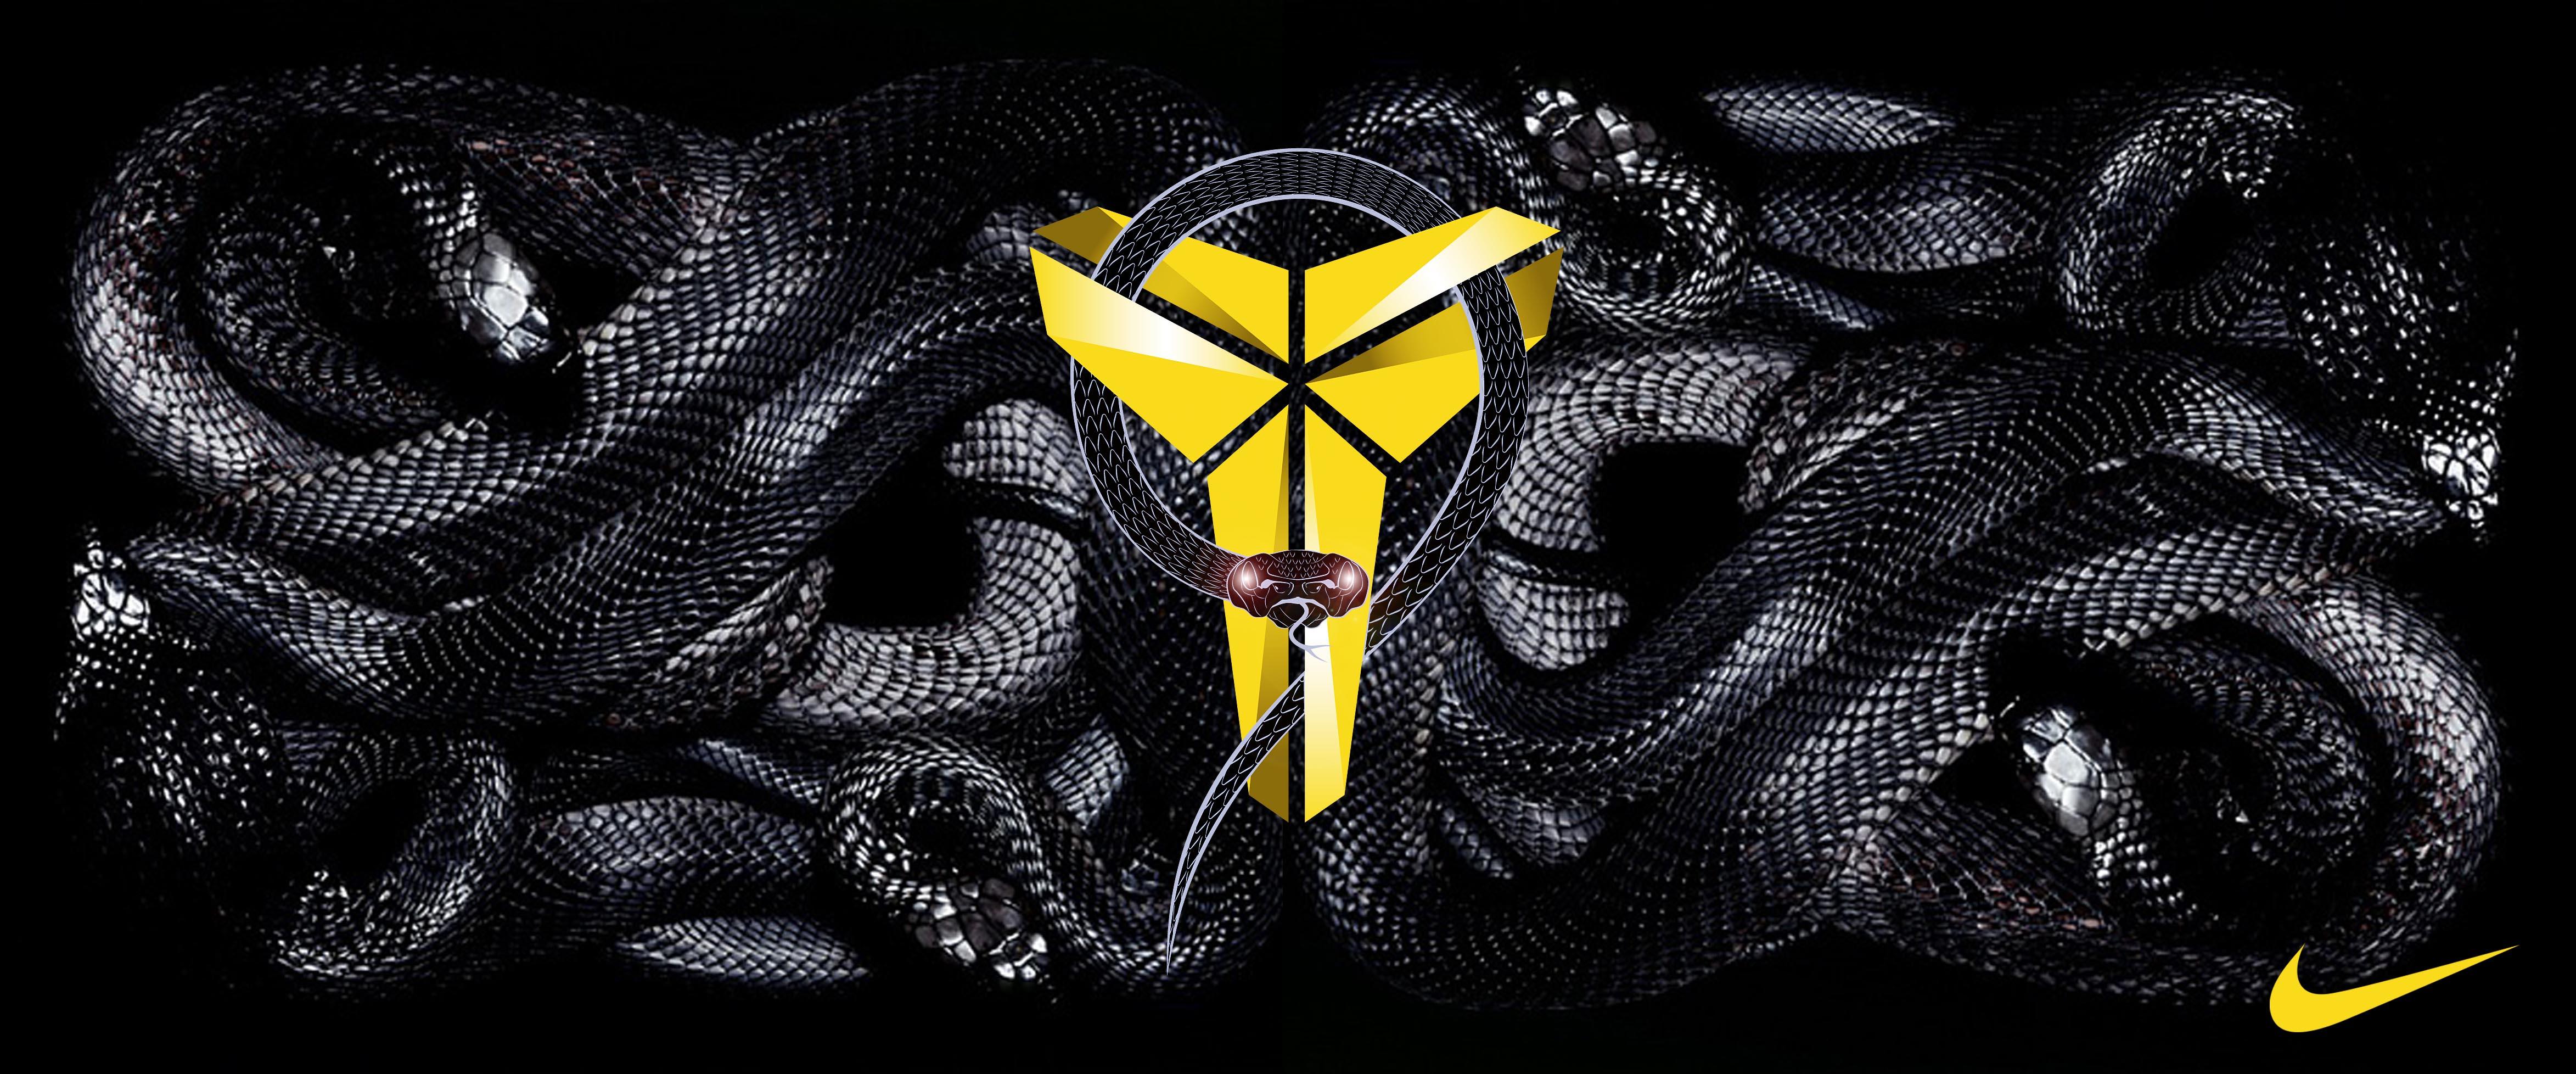 Pics Photos   Kobe Bryant Nike Hd Wallpaper 2966 4693x1956